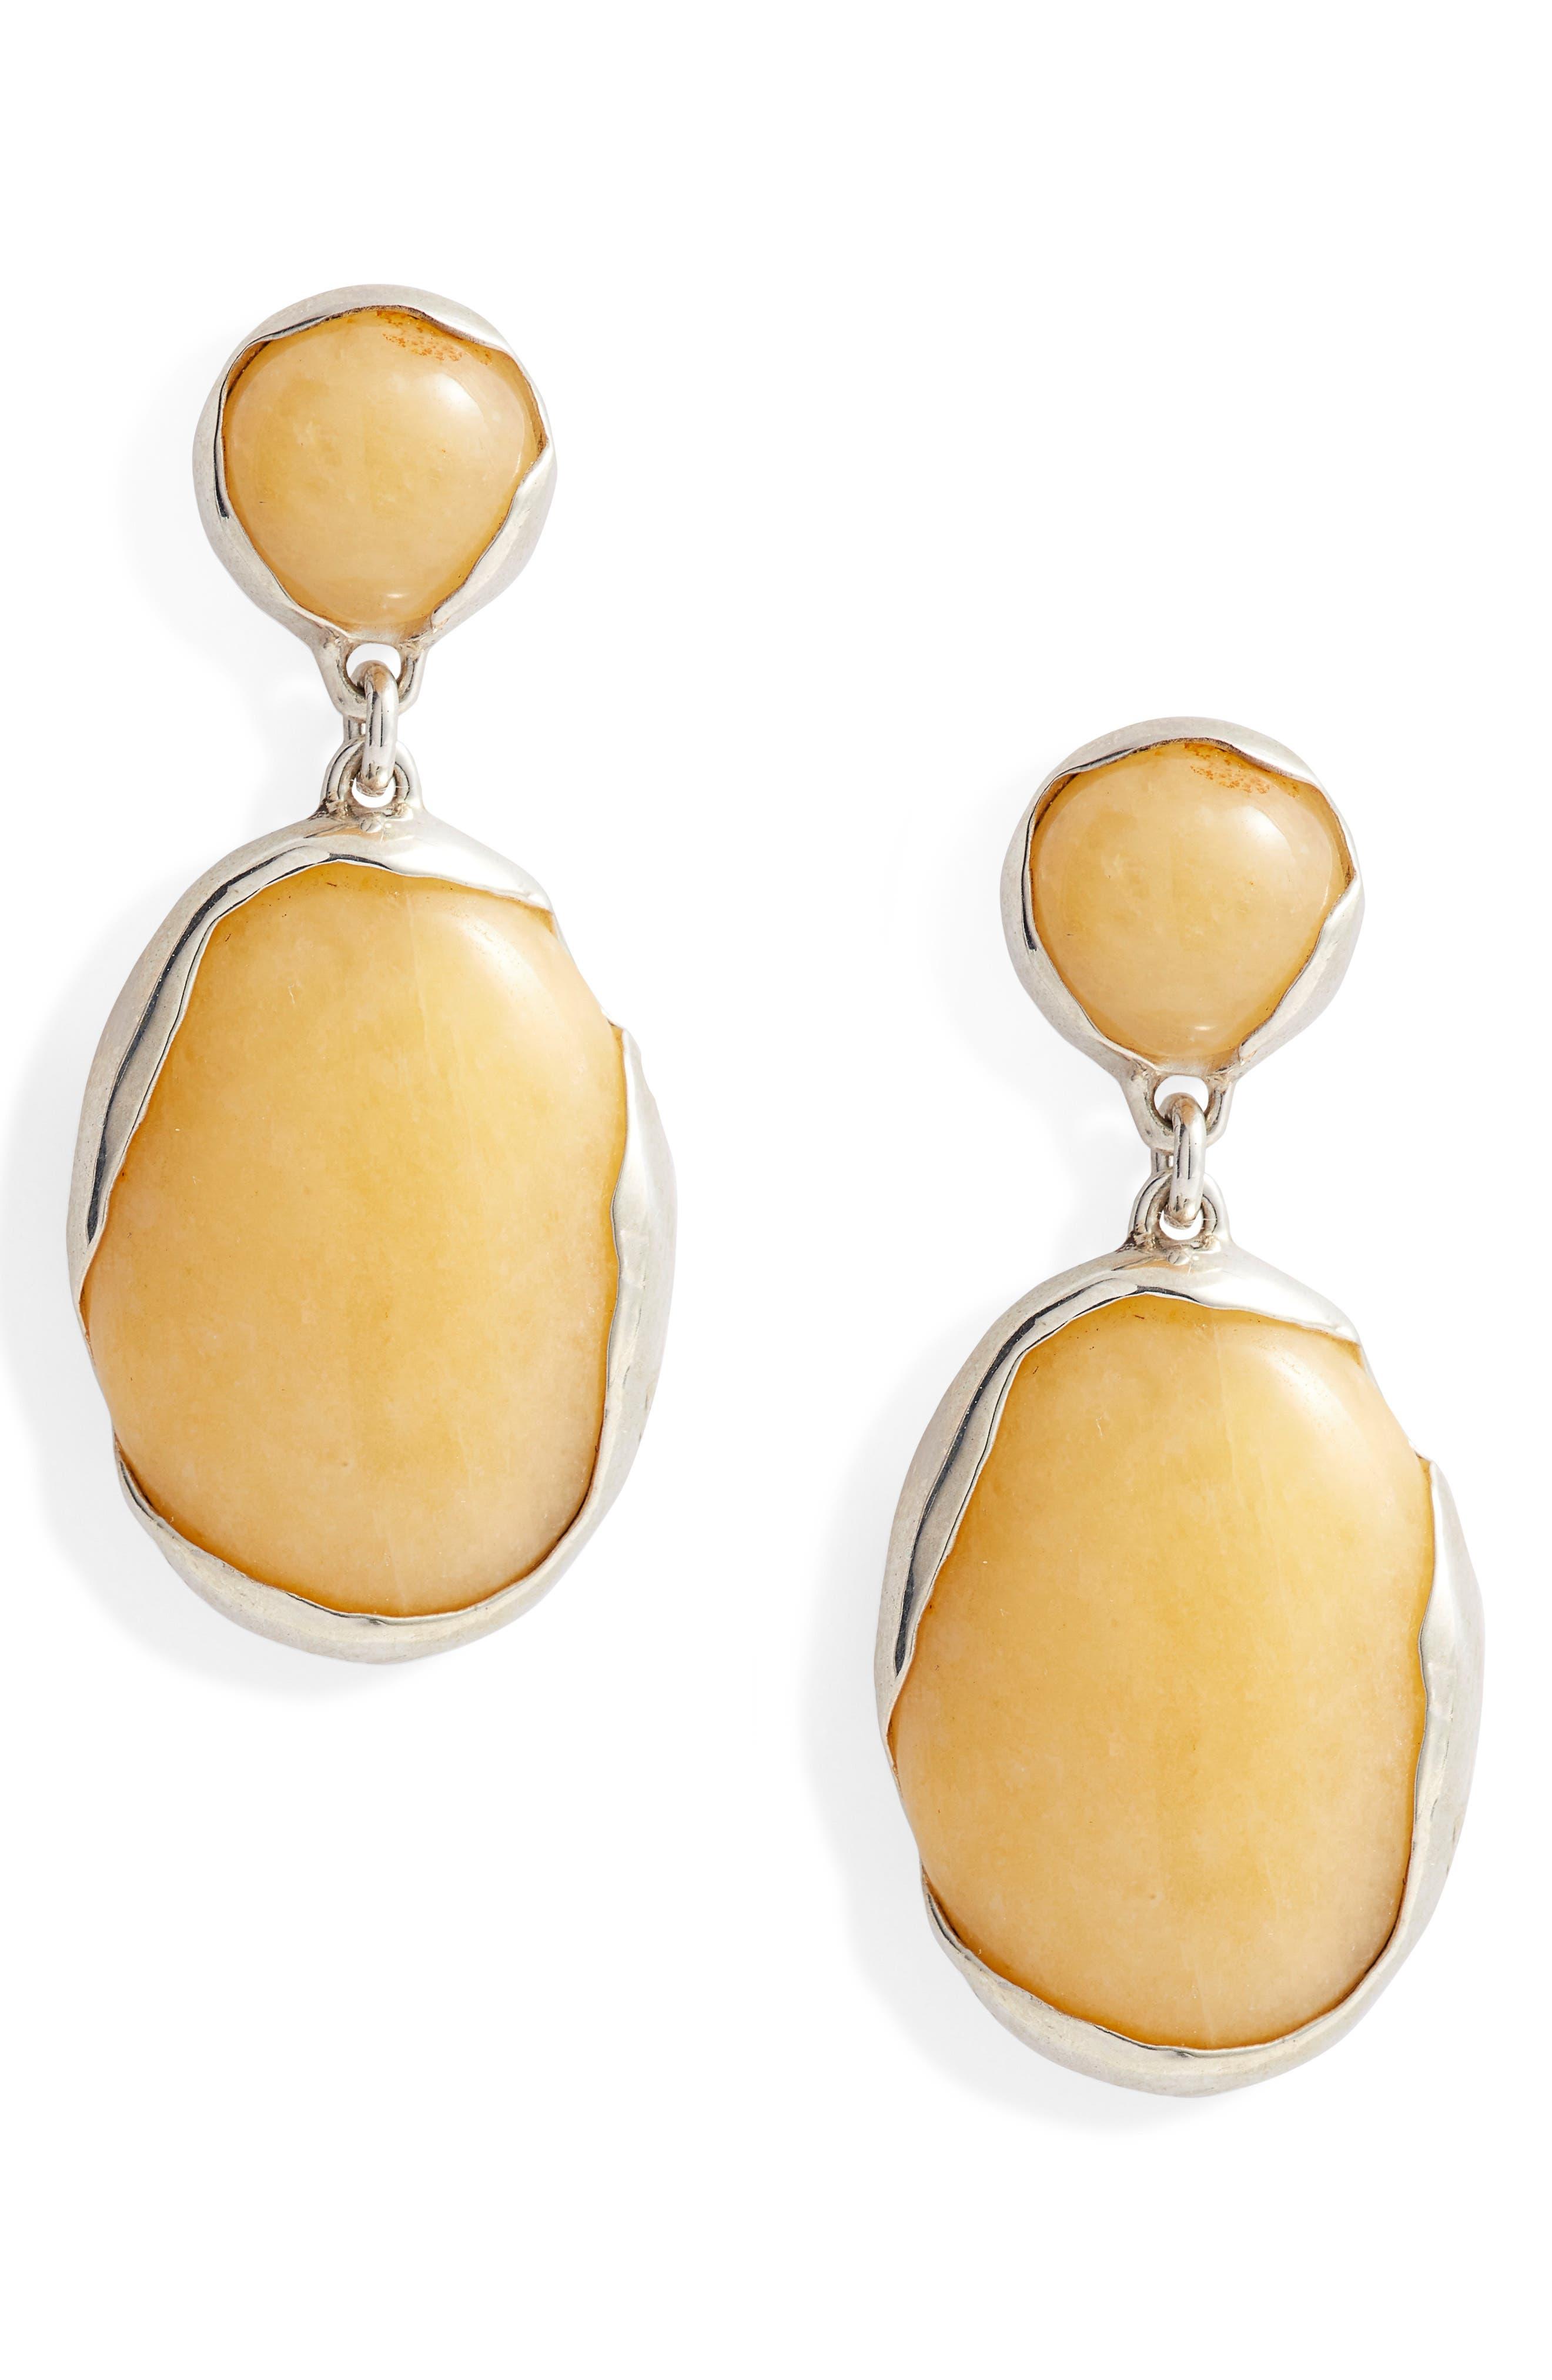 Ovo Stone Drop Earrings,                         Main,                         color, SILVER/ PINEAPPLE JASPER